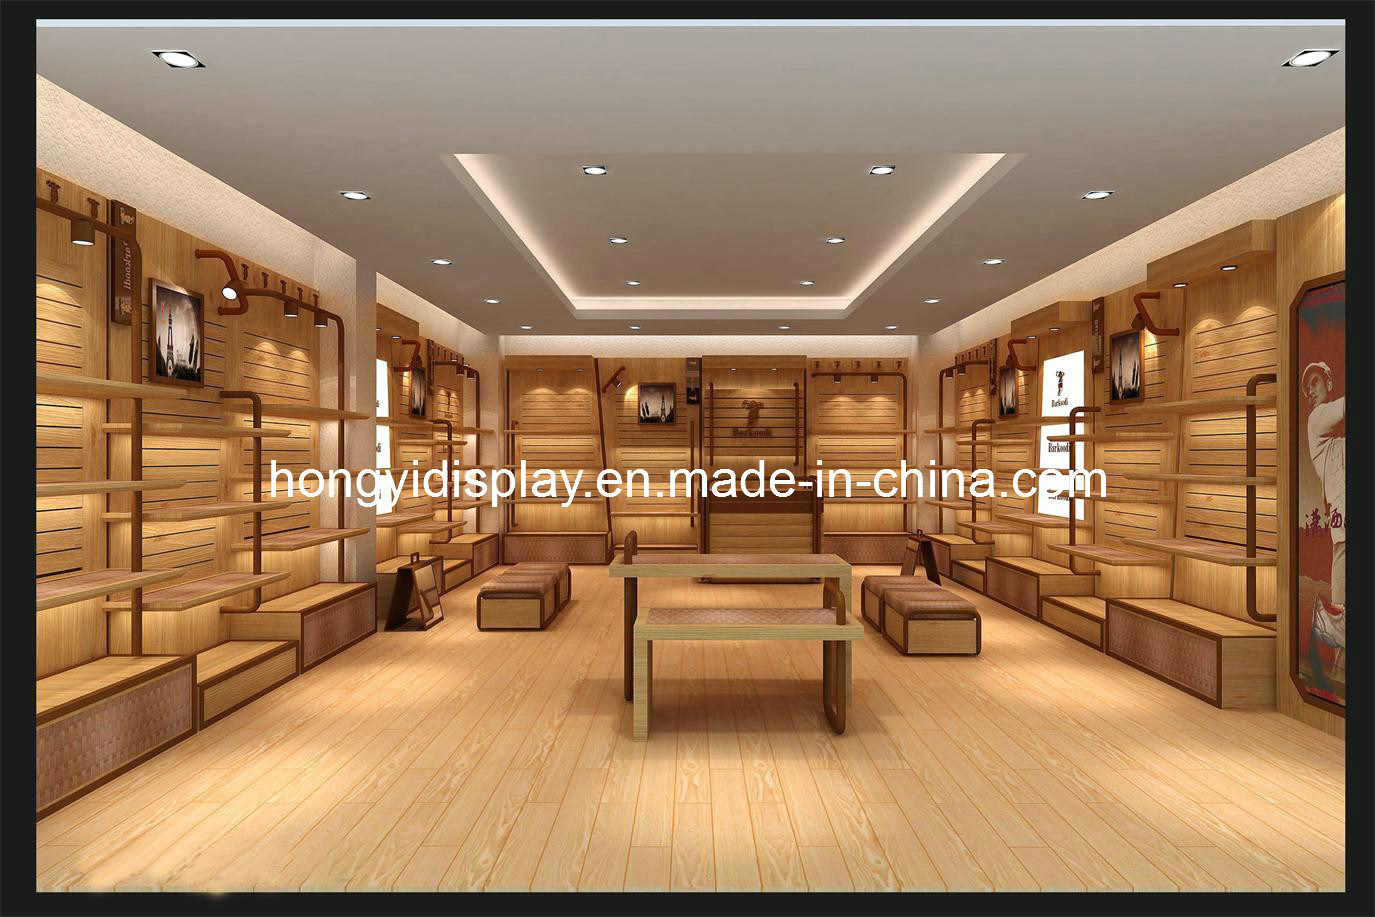 china men shoes shop decoration for store fixture china. Black Bedroom Furniture Sets. Home Design Ideas